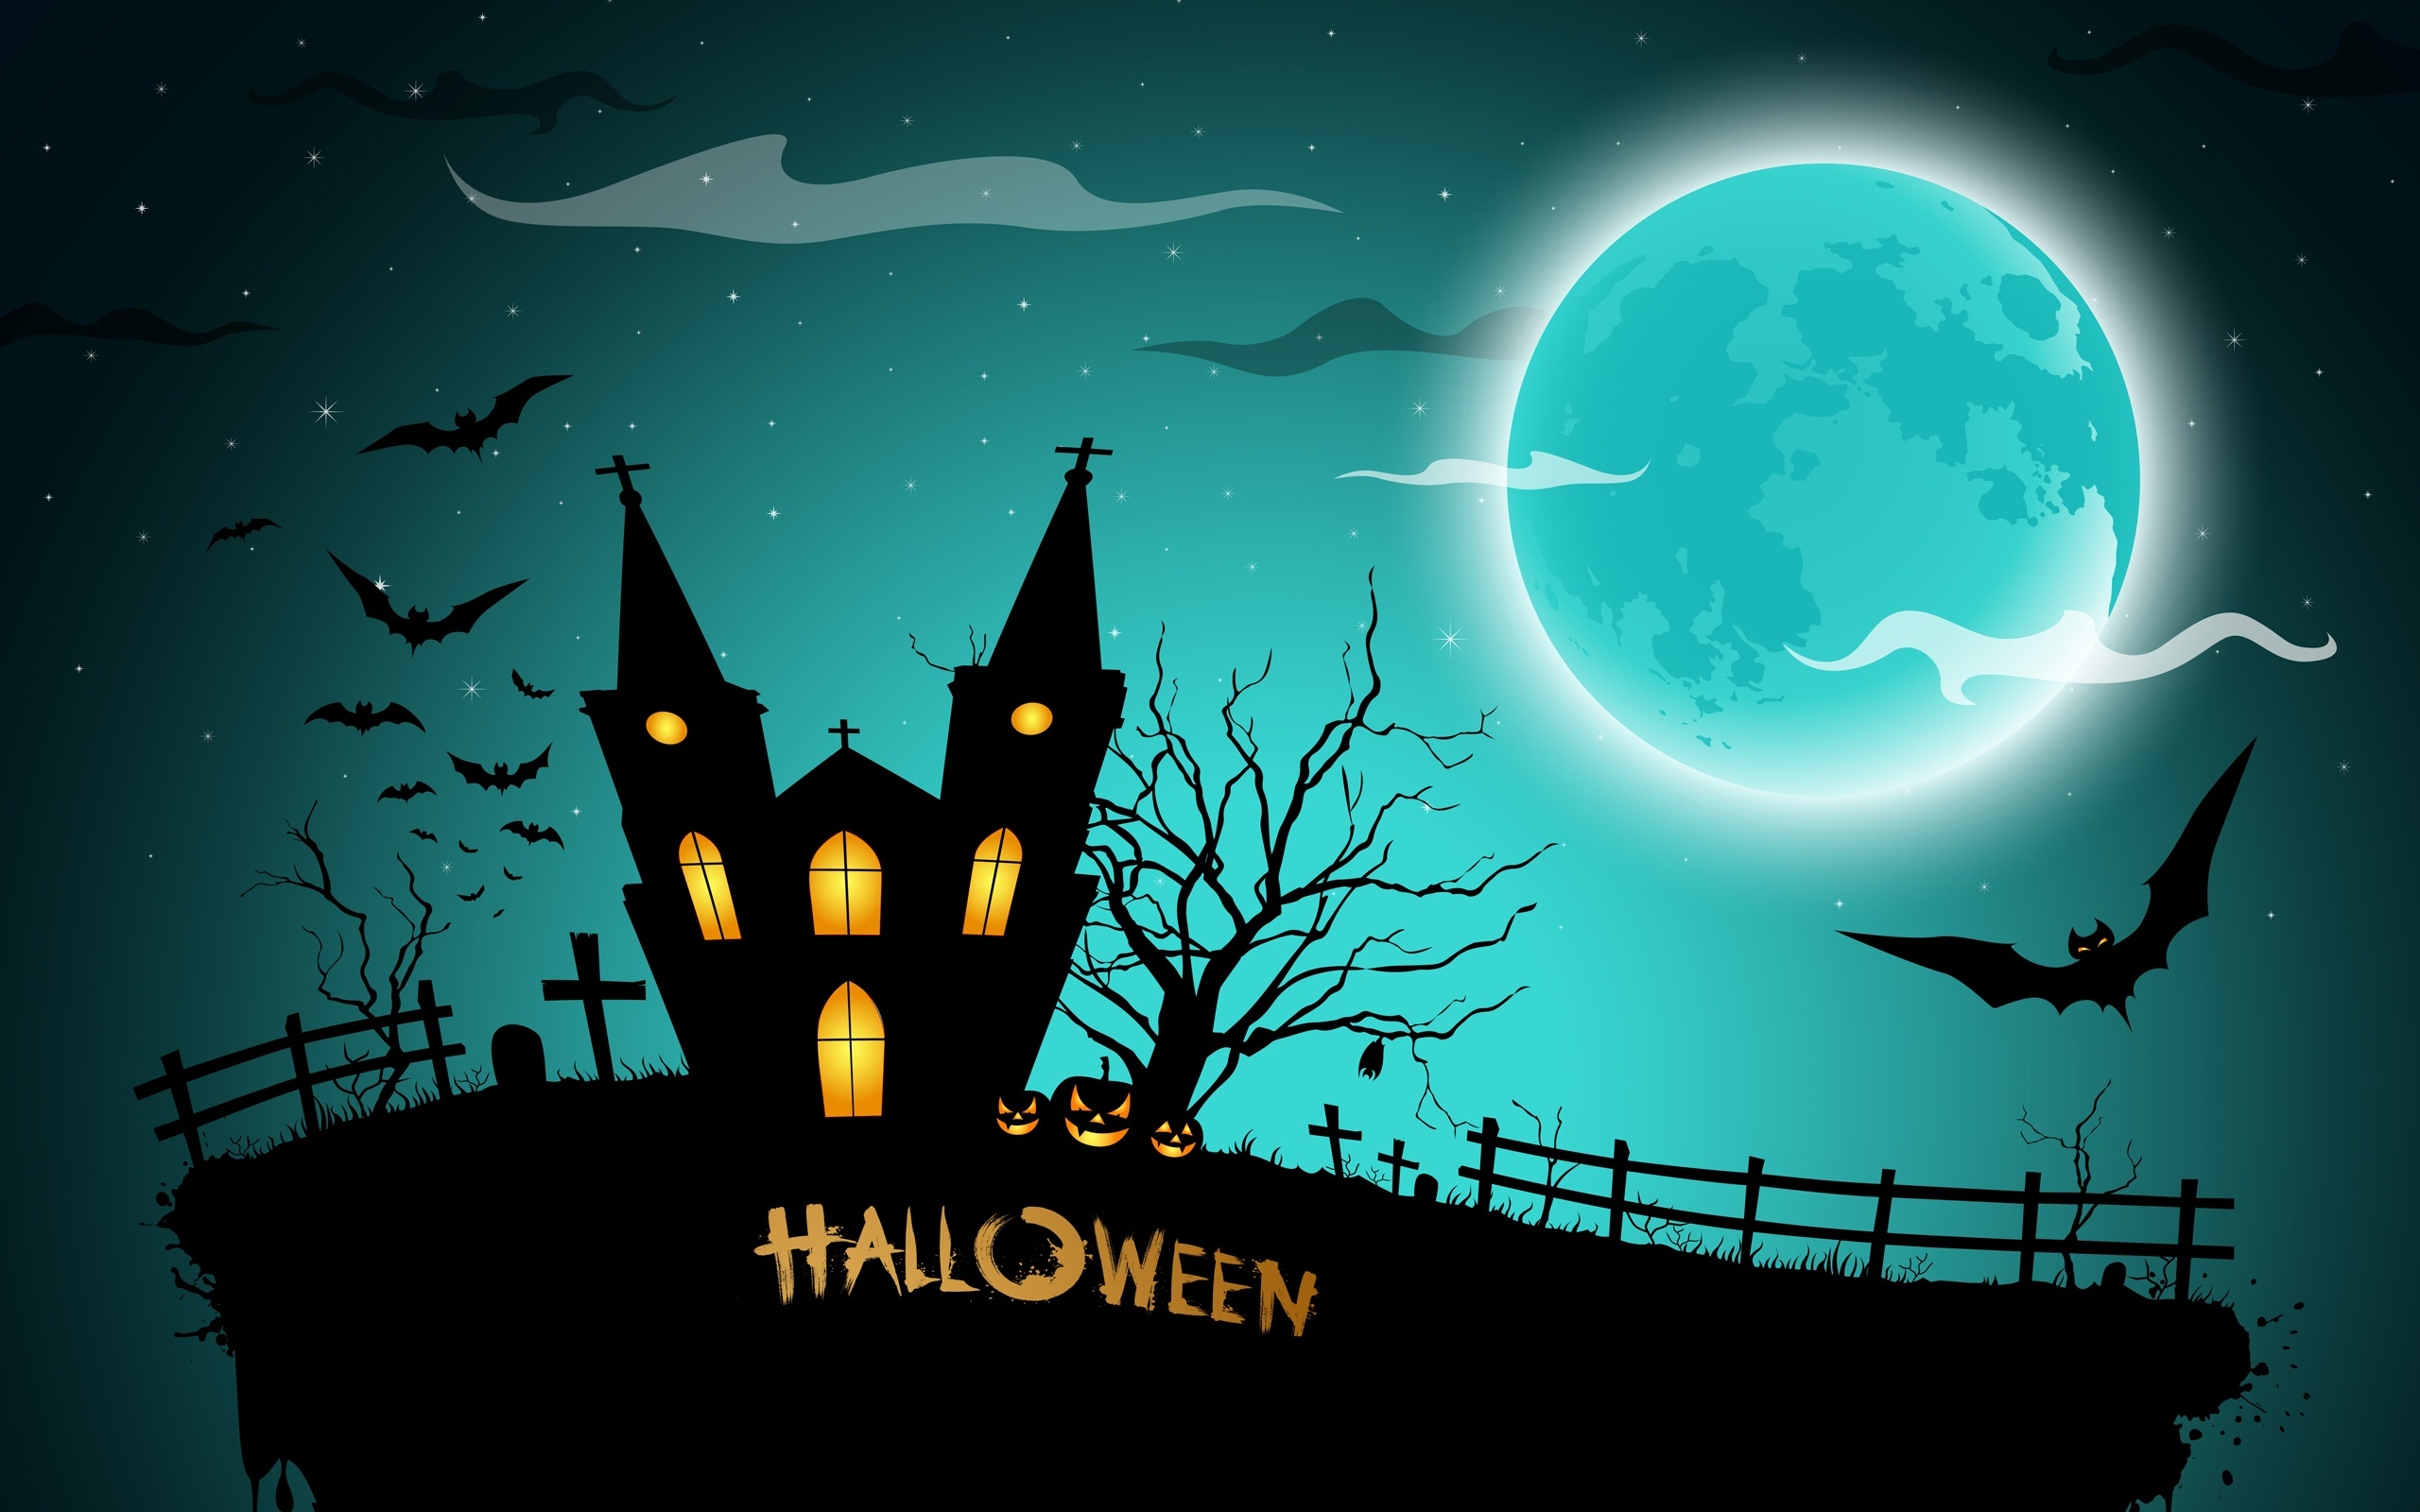 halloween gruselig mitternacht k rbisse flederm use haus vollmond 2560x1600 hd. Black Bedroom Furniture Sets. Home Design Ideas